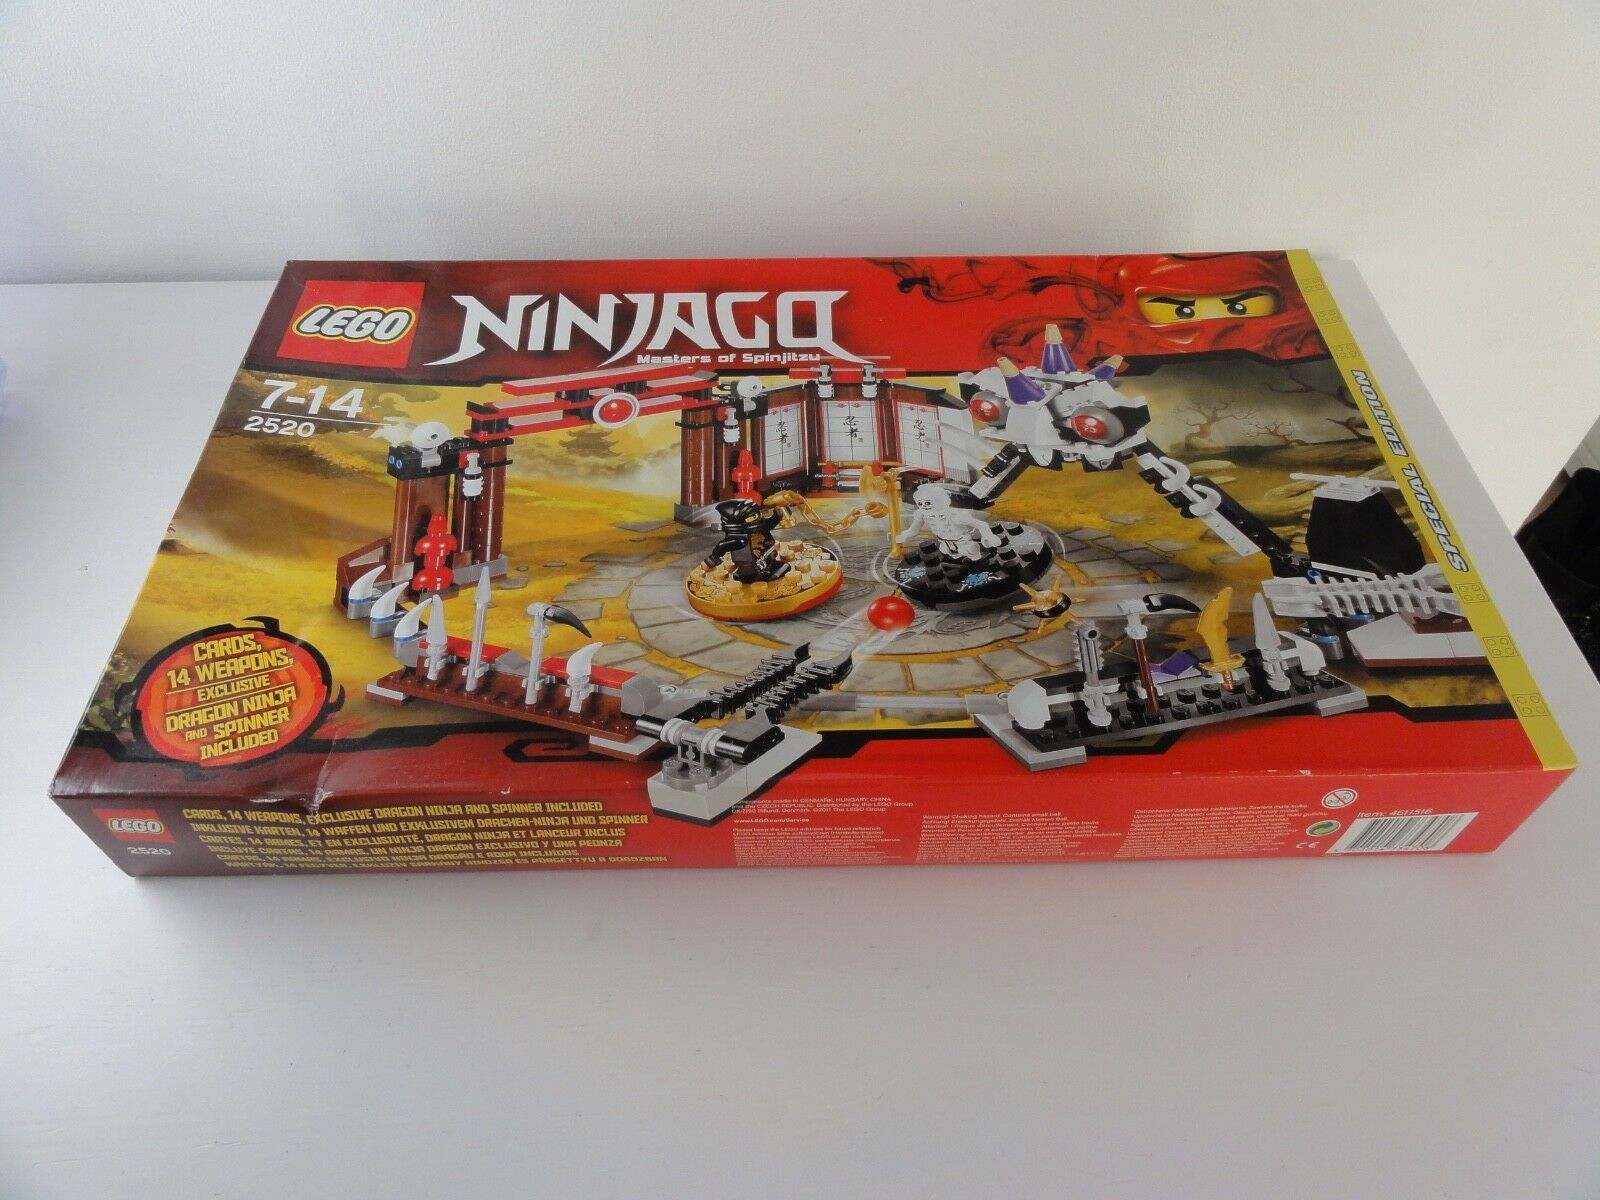 Lego 2520 setnr. ninjago  ovp nouveau neu masters of spinjitzu  distribution globale